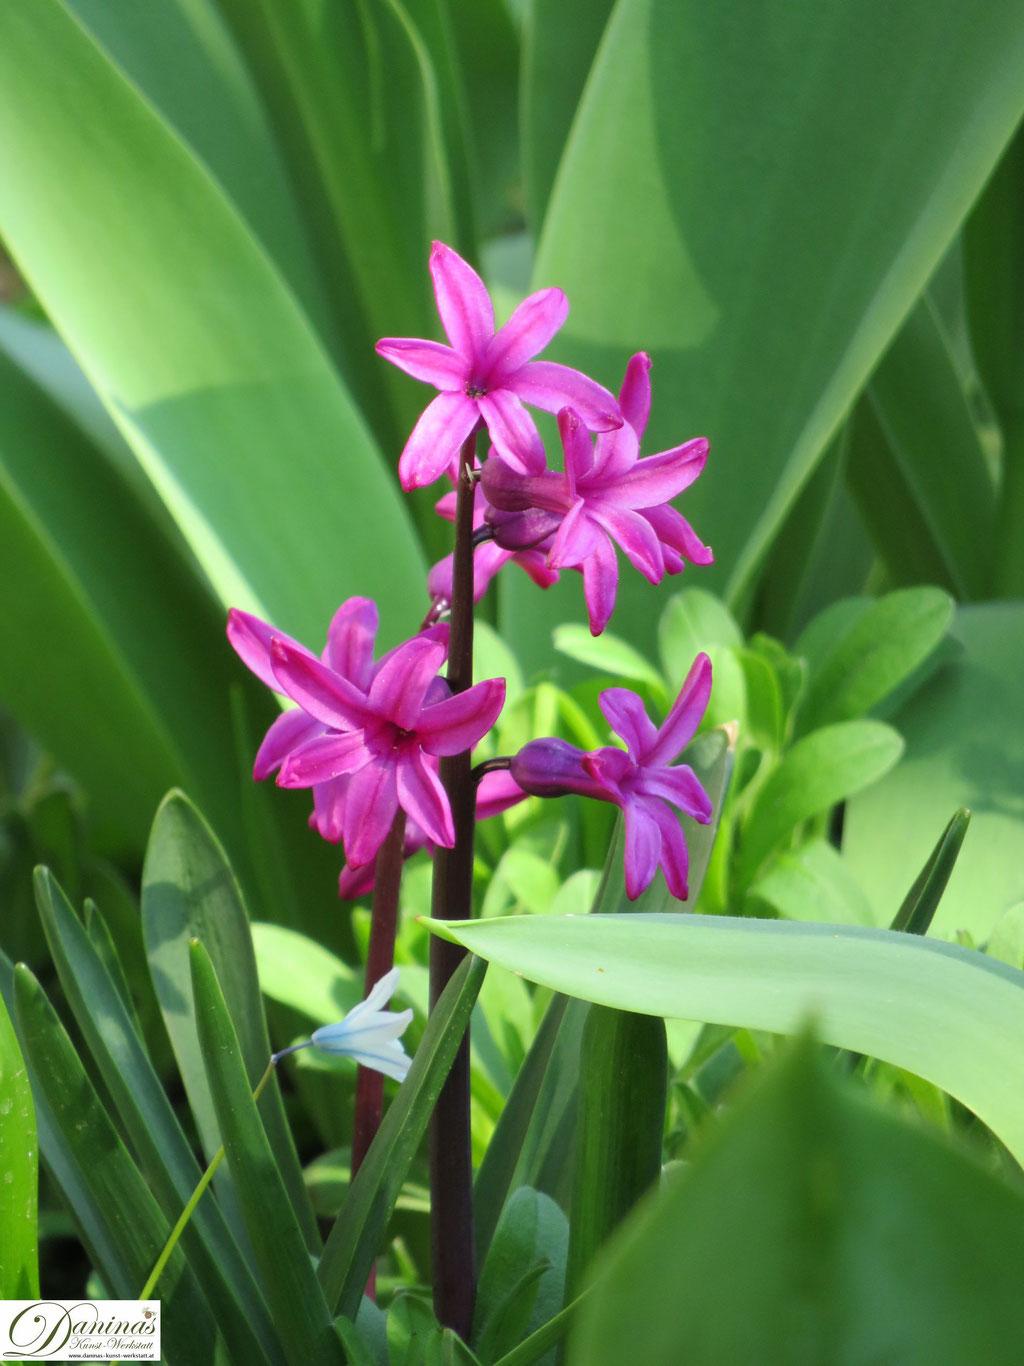 Hyazinthe - Frühlingsblumen im Garten